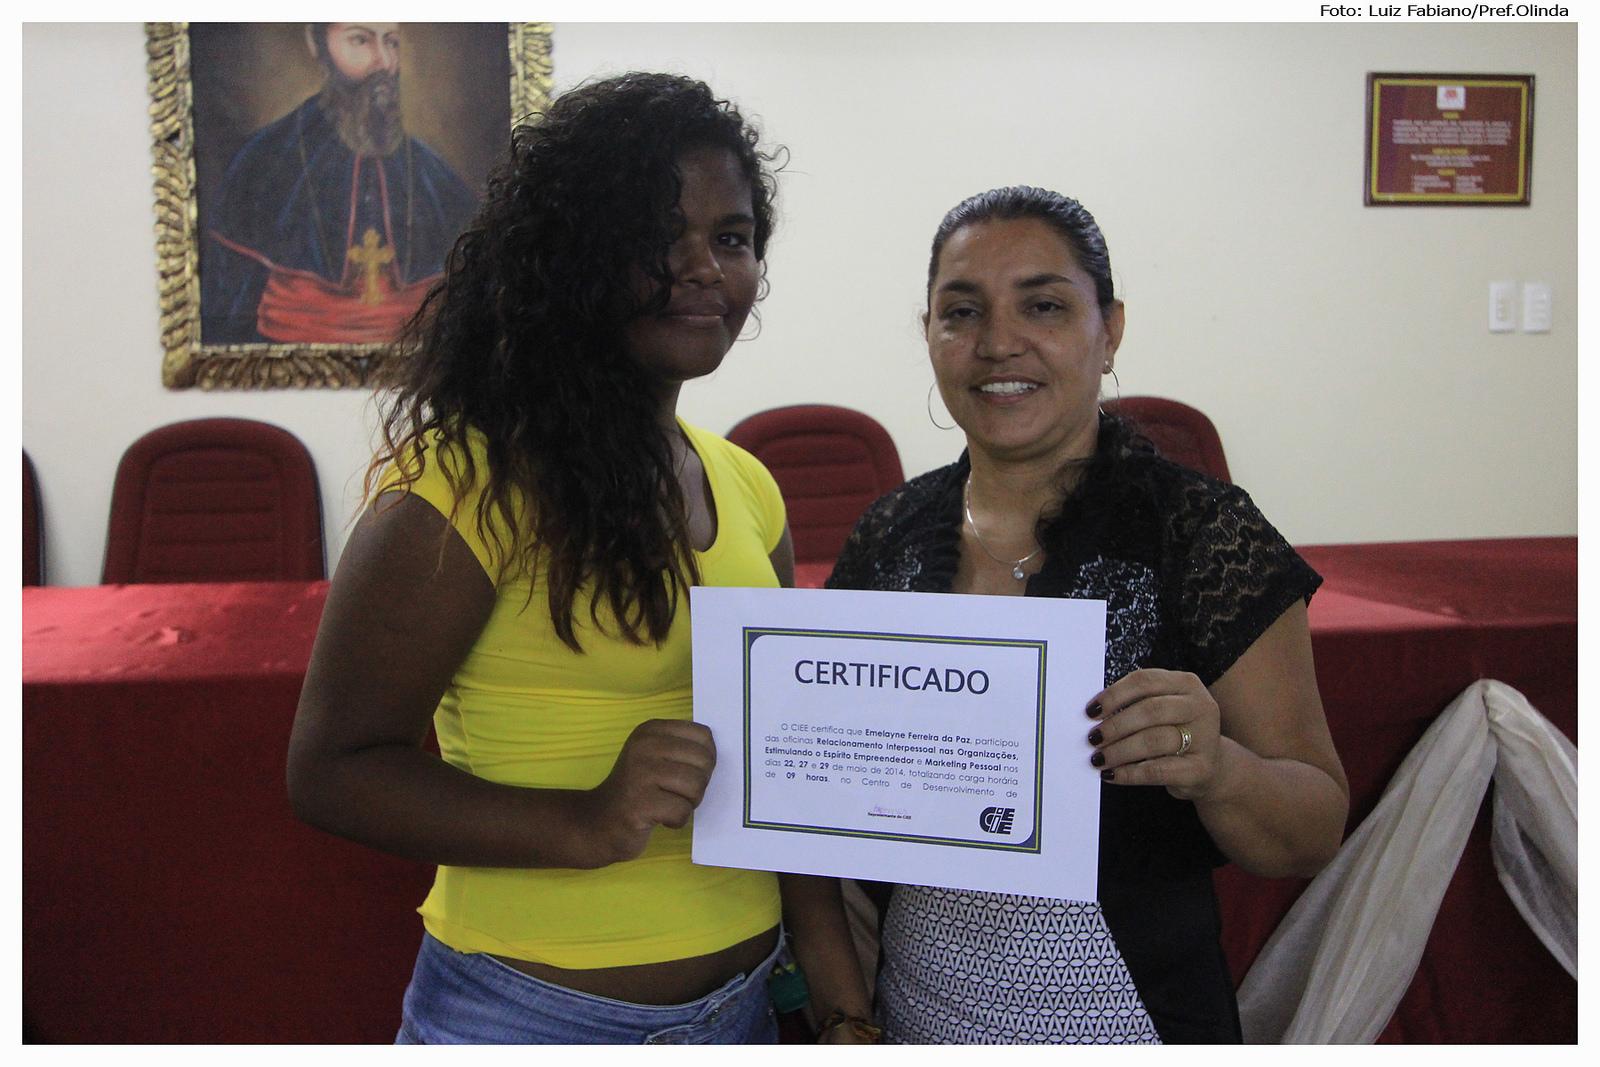 Parceria entre prefeitura e CIEE/PE. Foto: Luiz Fabiano/Pref.Olinda